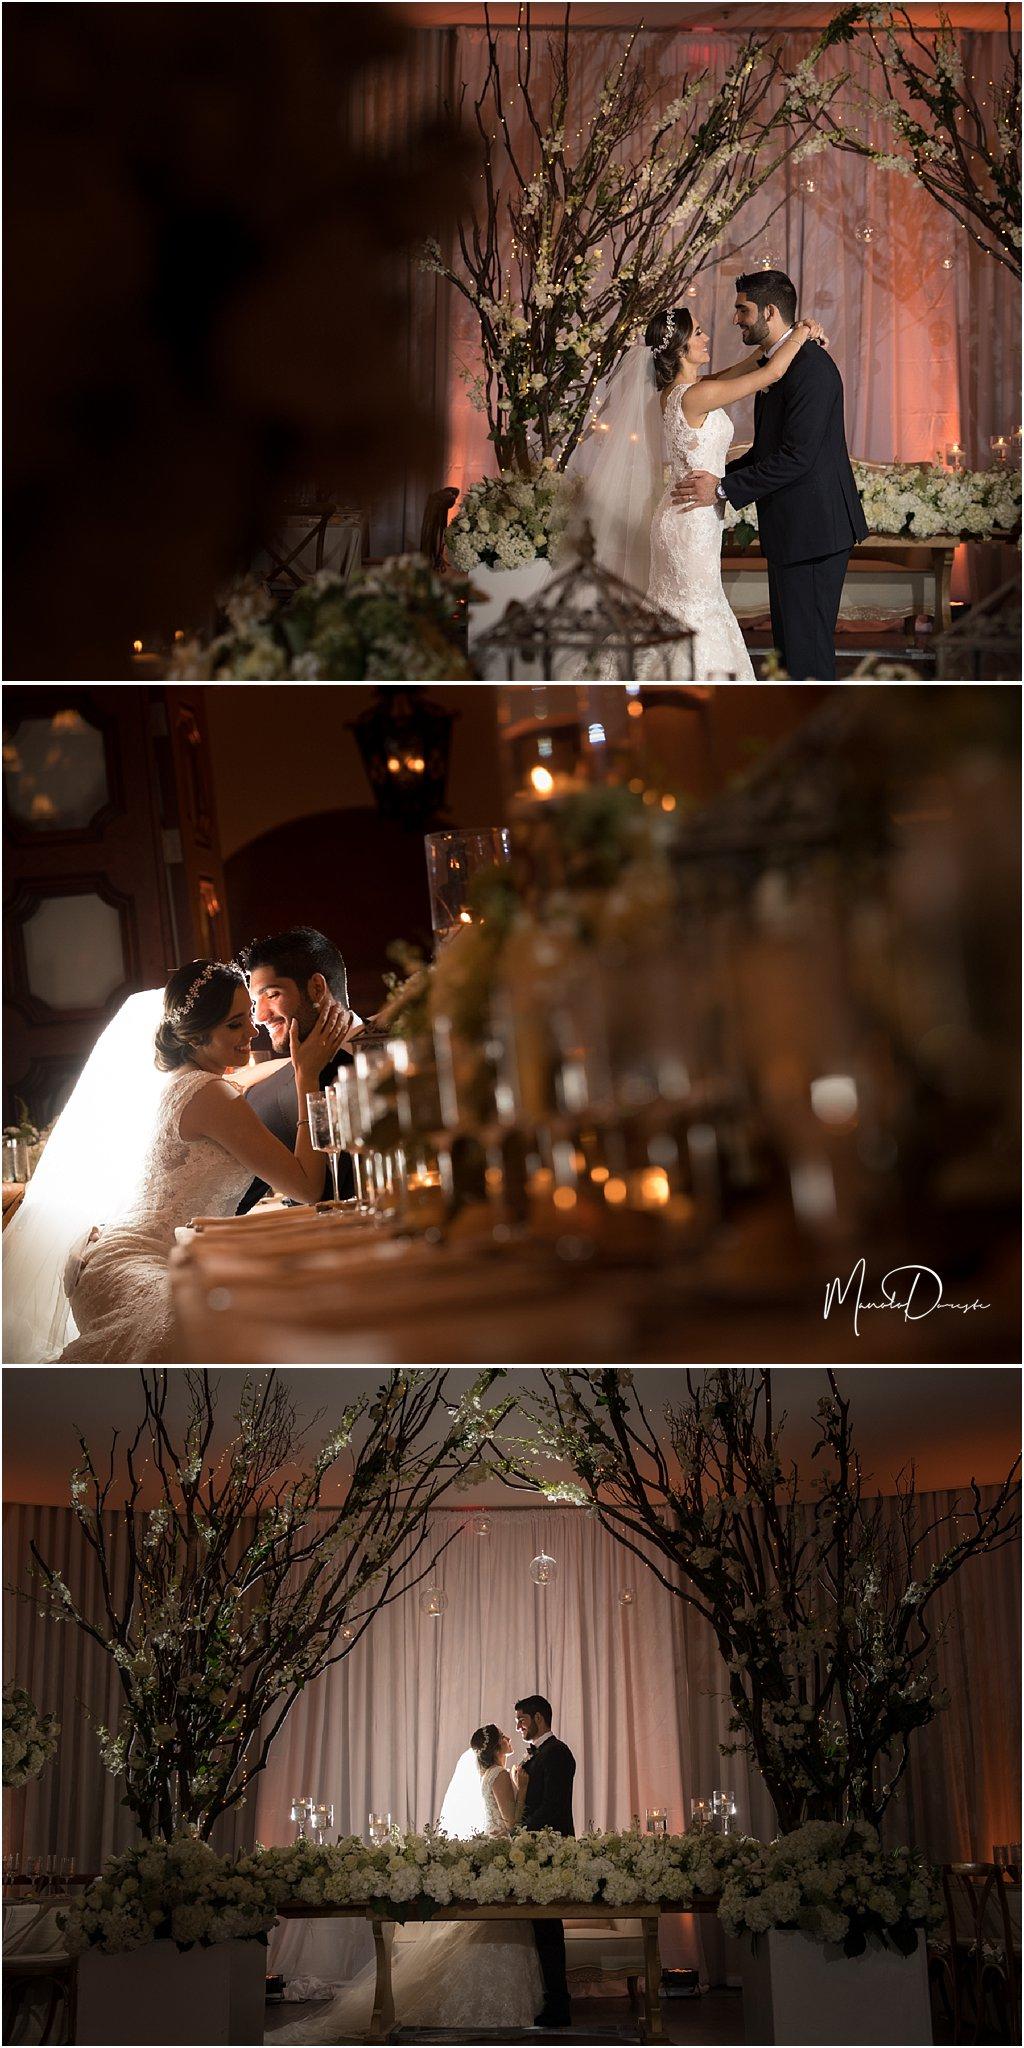 00942_ManoloDoreste_InFocusStudios_Wedding_Family_Photography_Miami_MiamiPhotographer.jpg